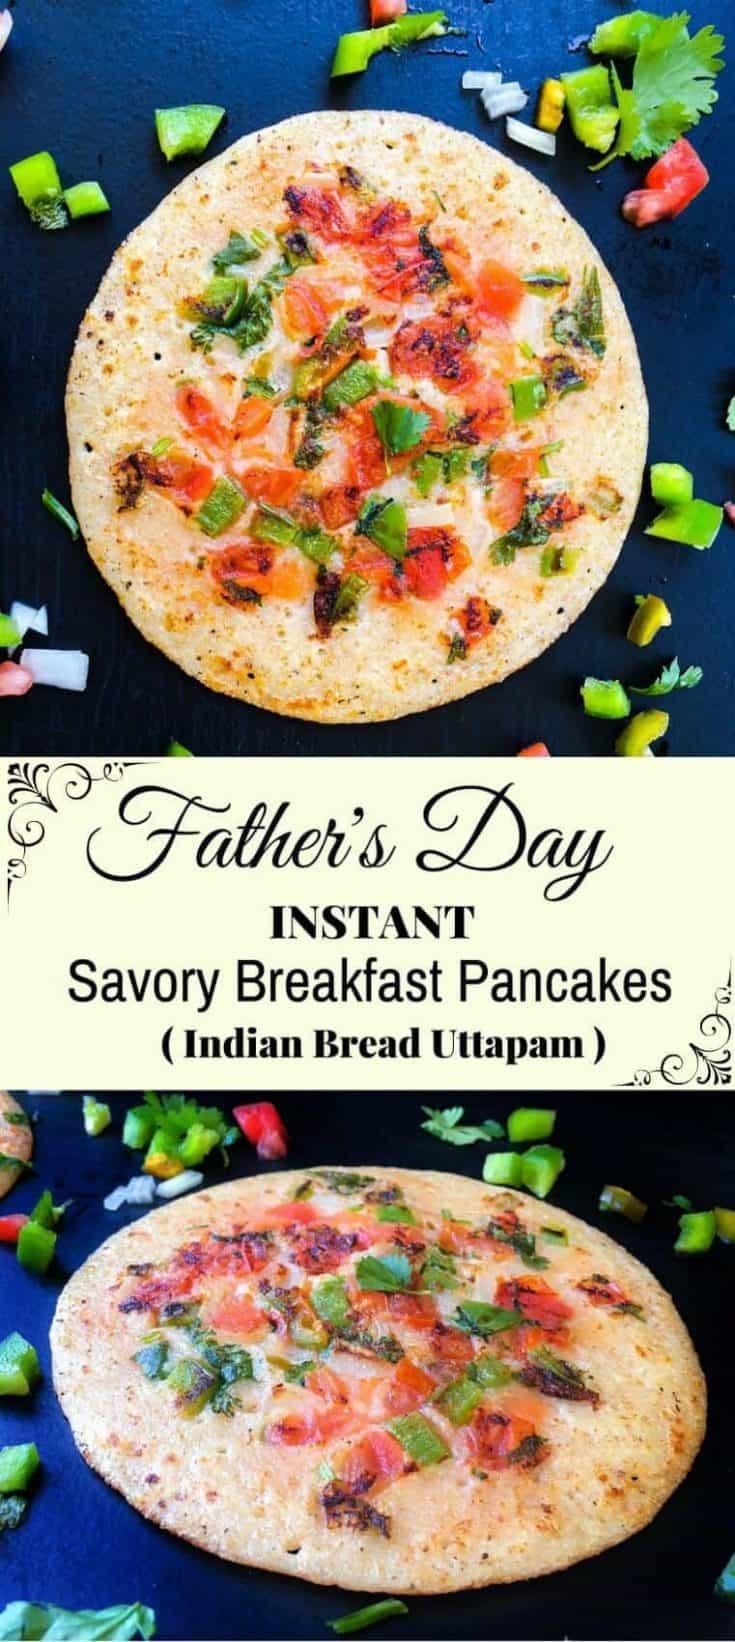 Instant Uttapam Recipe using Sooji - Bread: #uttapam #instantuttapam #sooji #breaduttapam #indianfood #fathersday